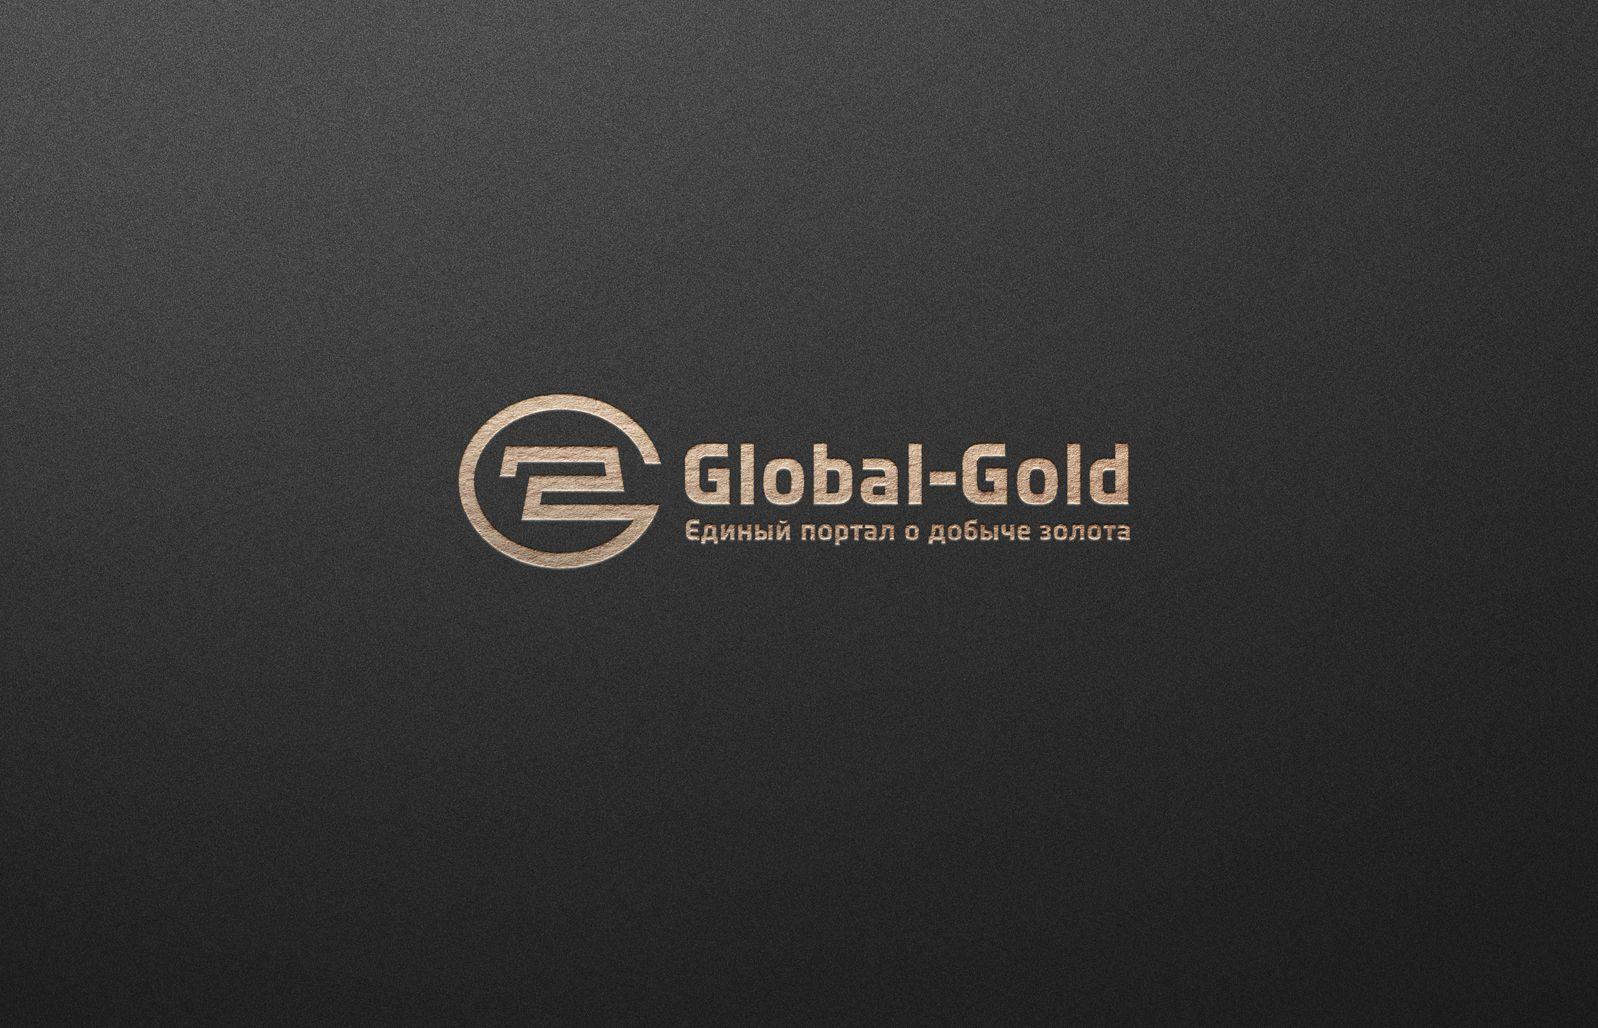 Логотип для Global-Gold - дизайнер andblin61